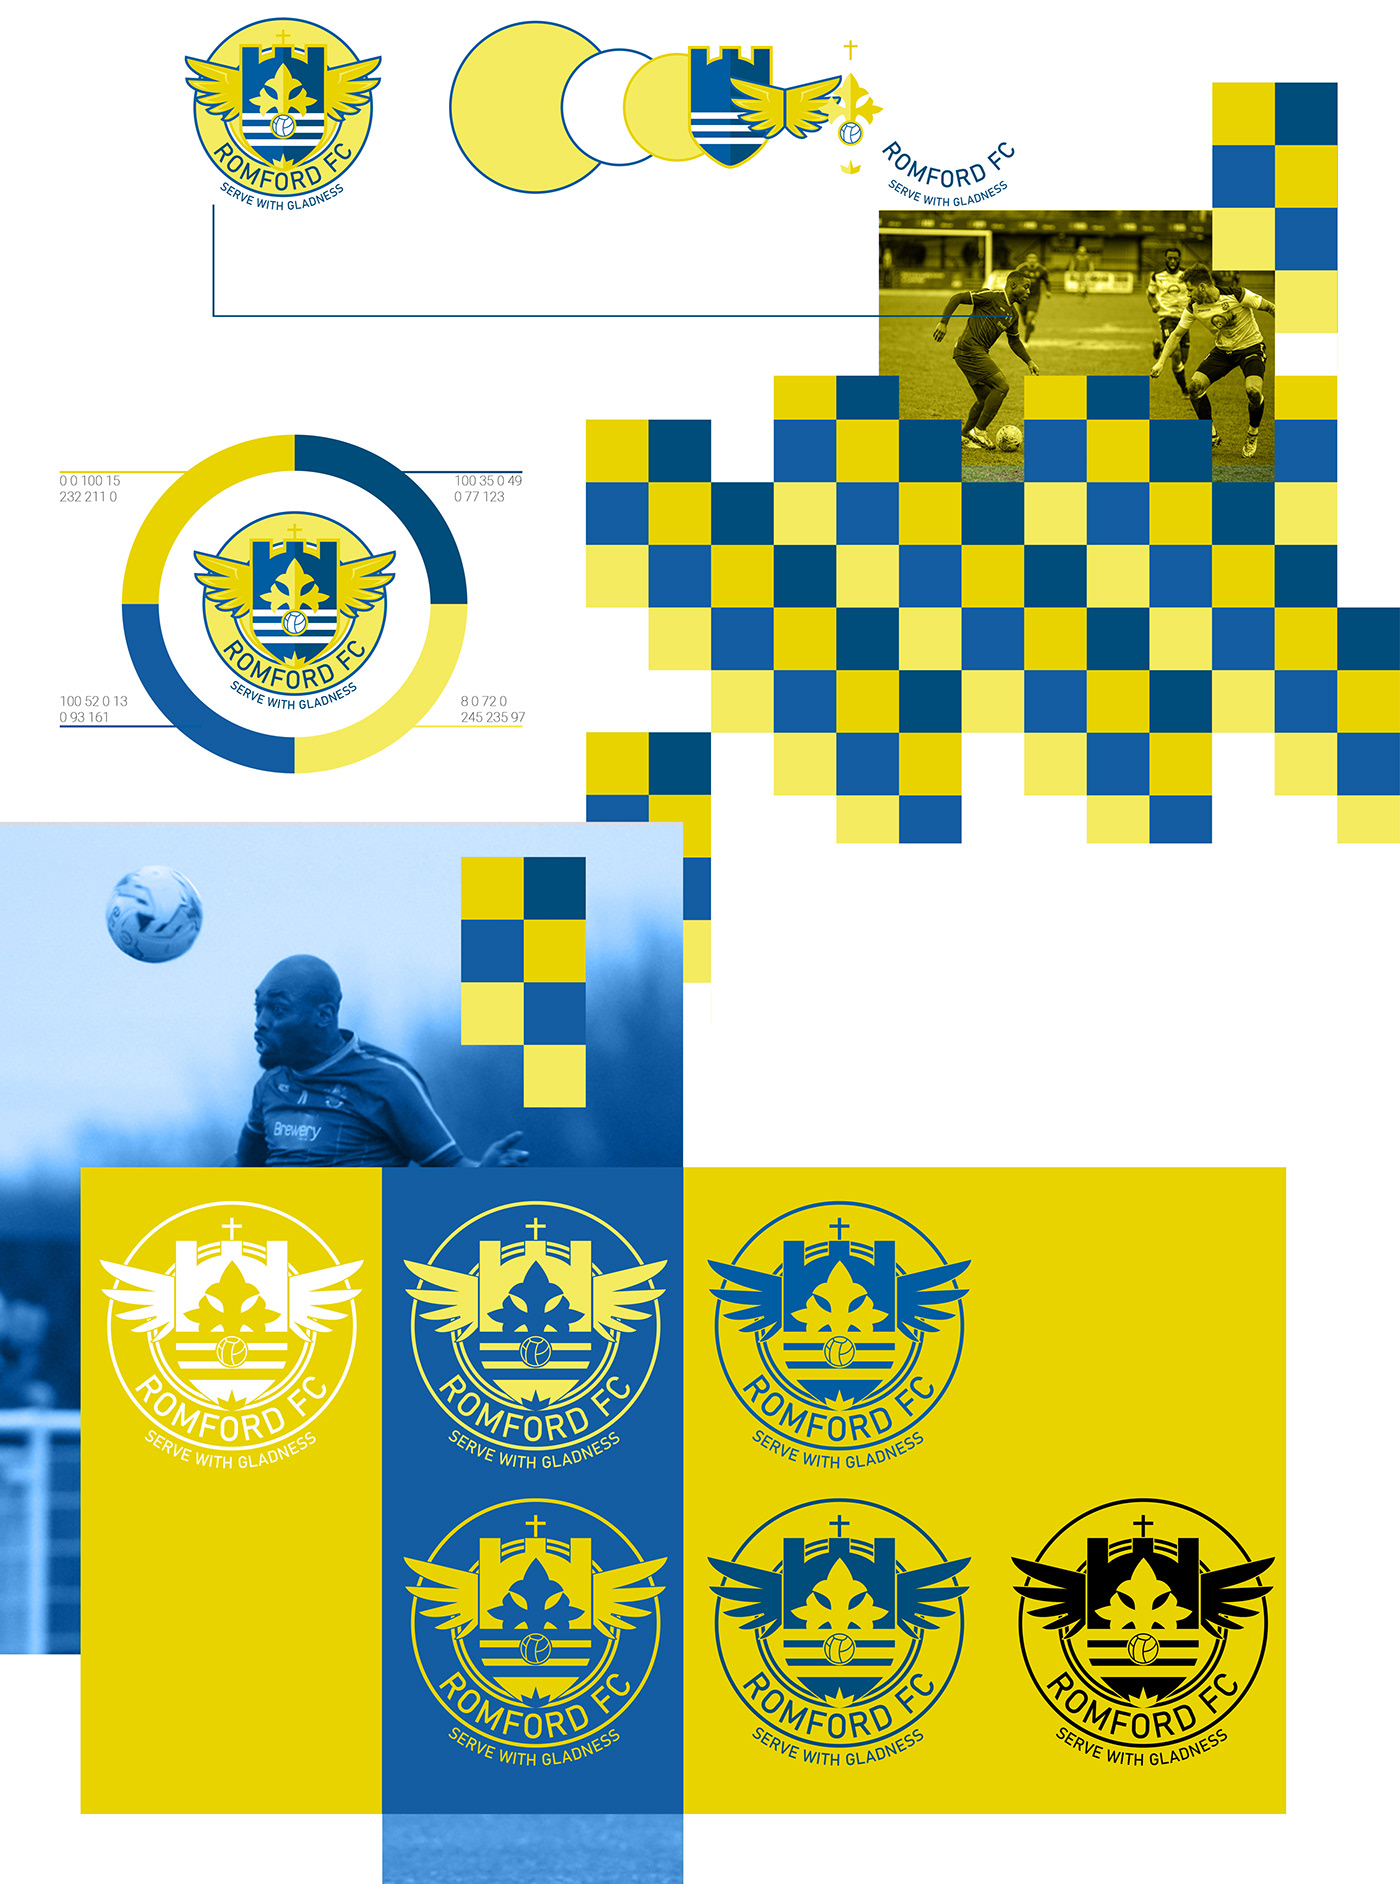 football soccer Rebrand gleen tamplin Romford Futbol premier